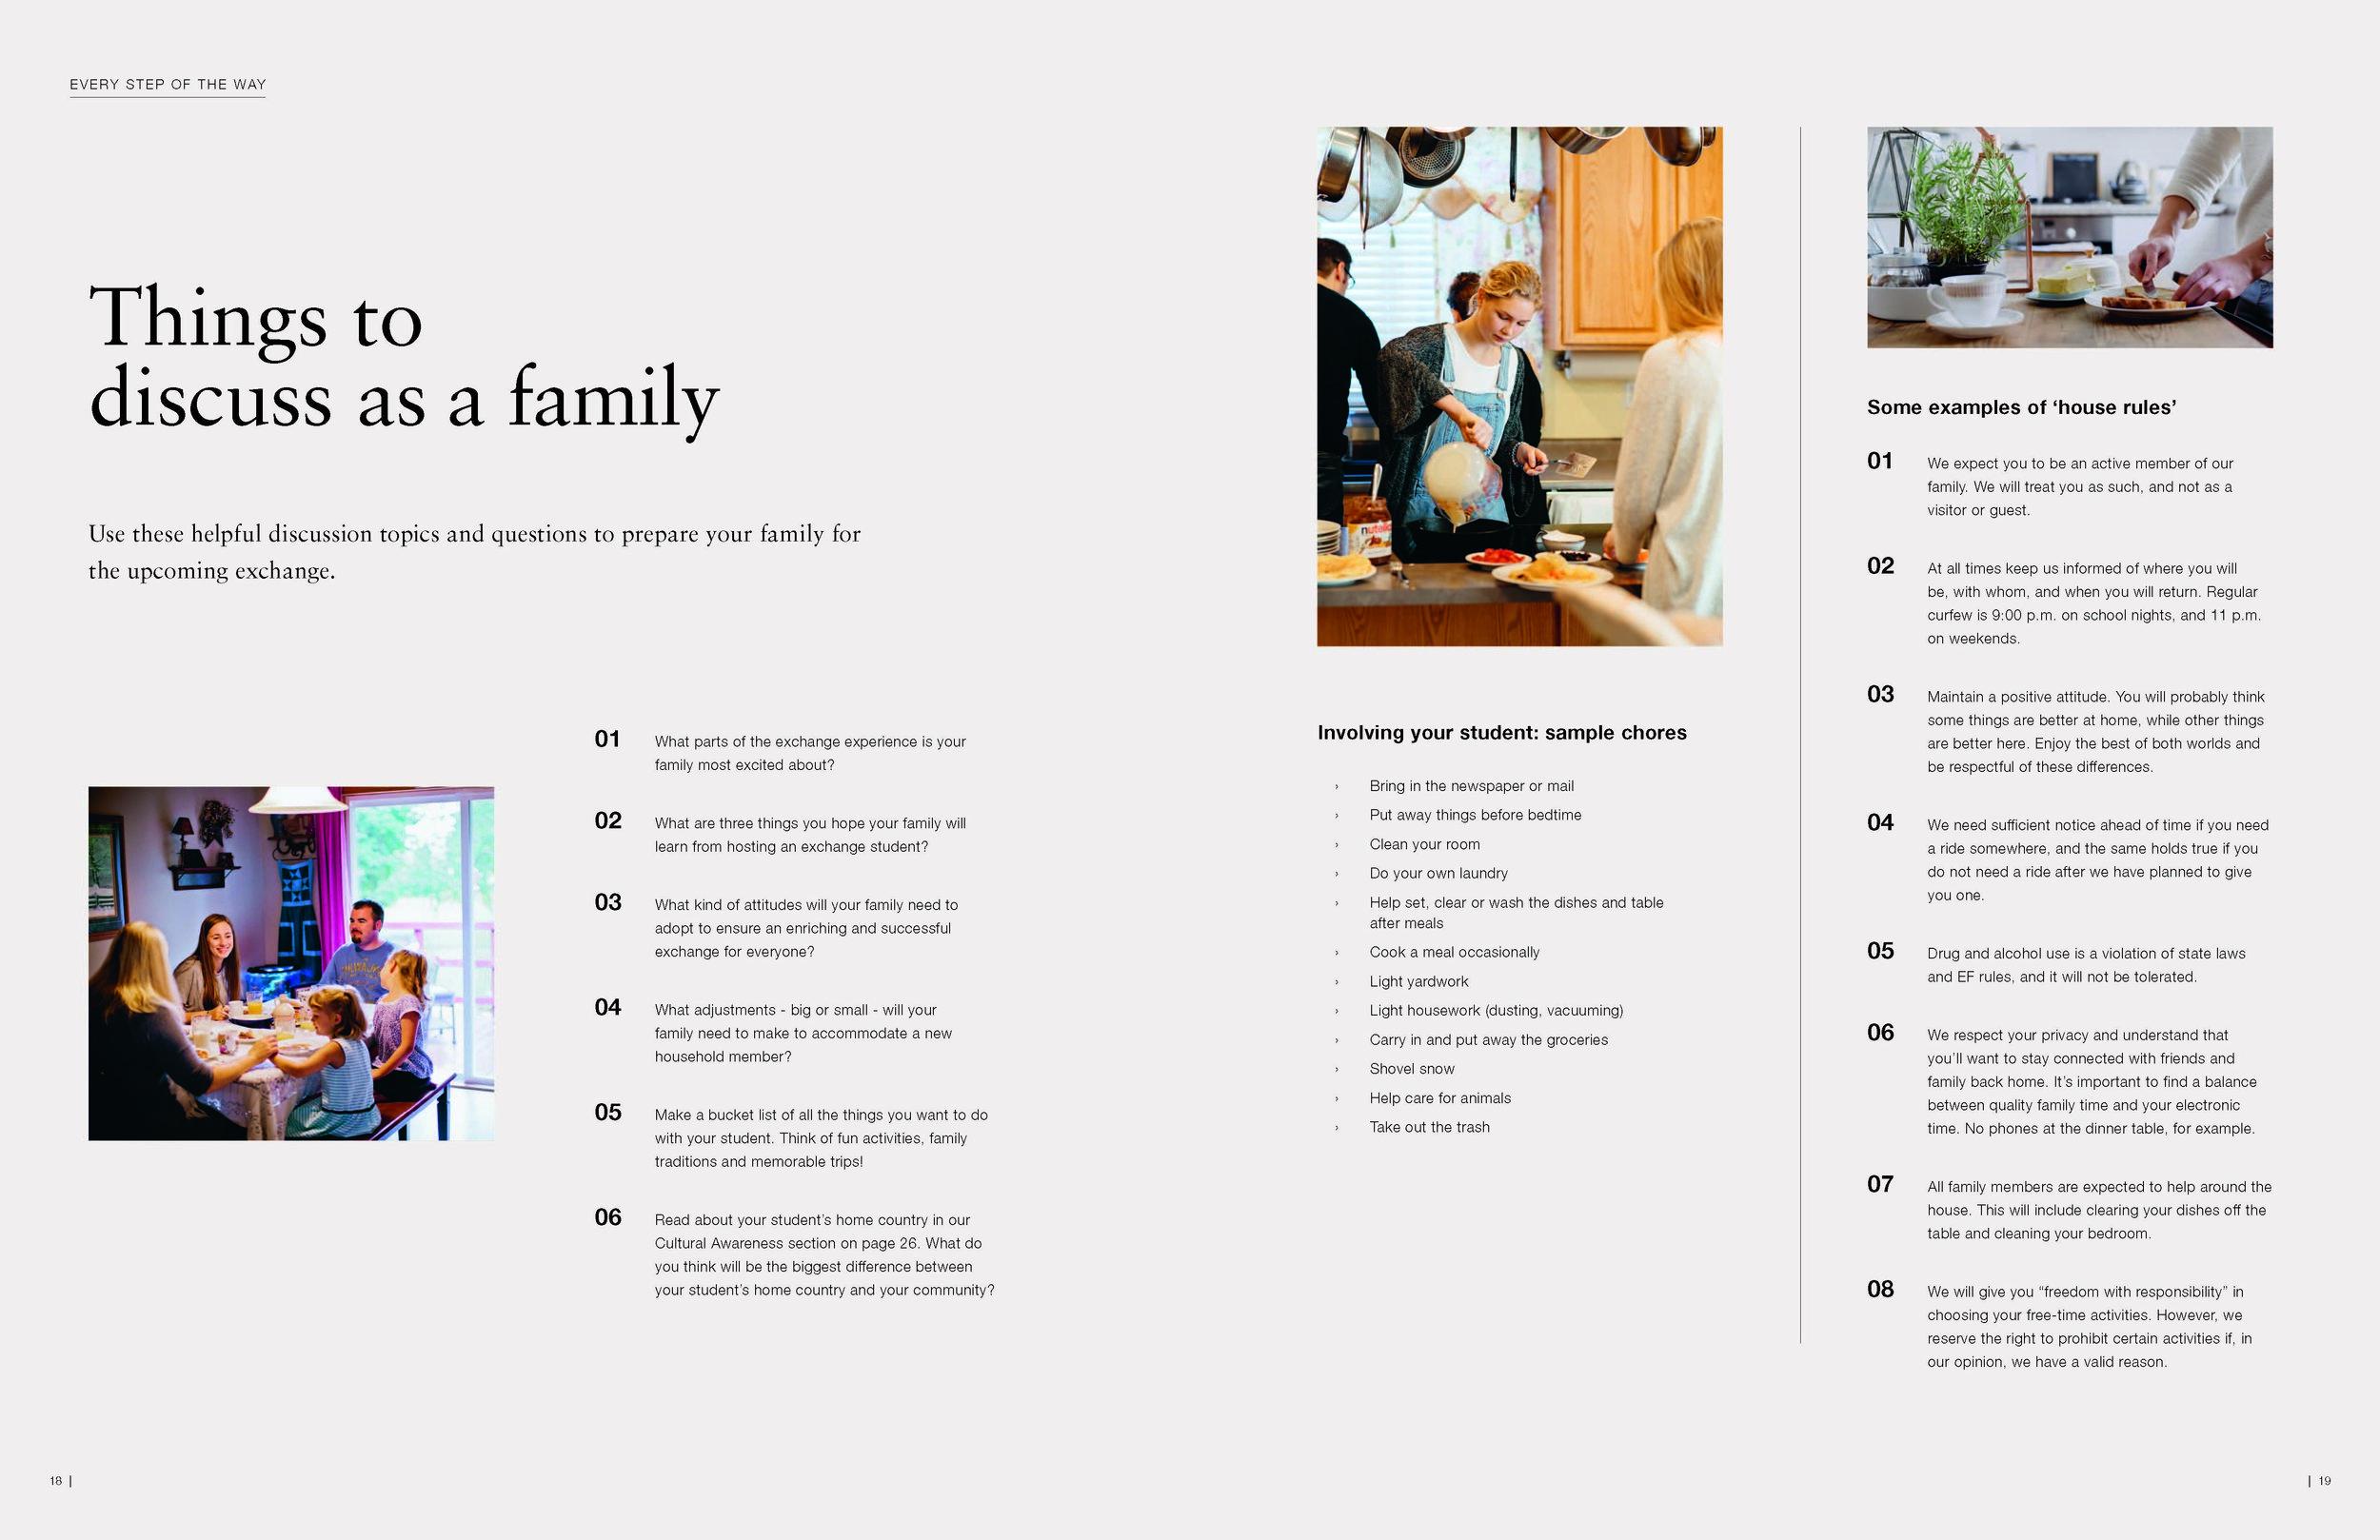 18_HSEY_HF_handbook_digital_spread.636716654893475967_Page_10.jpg